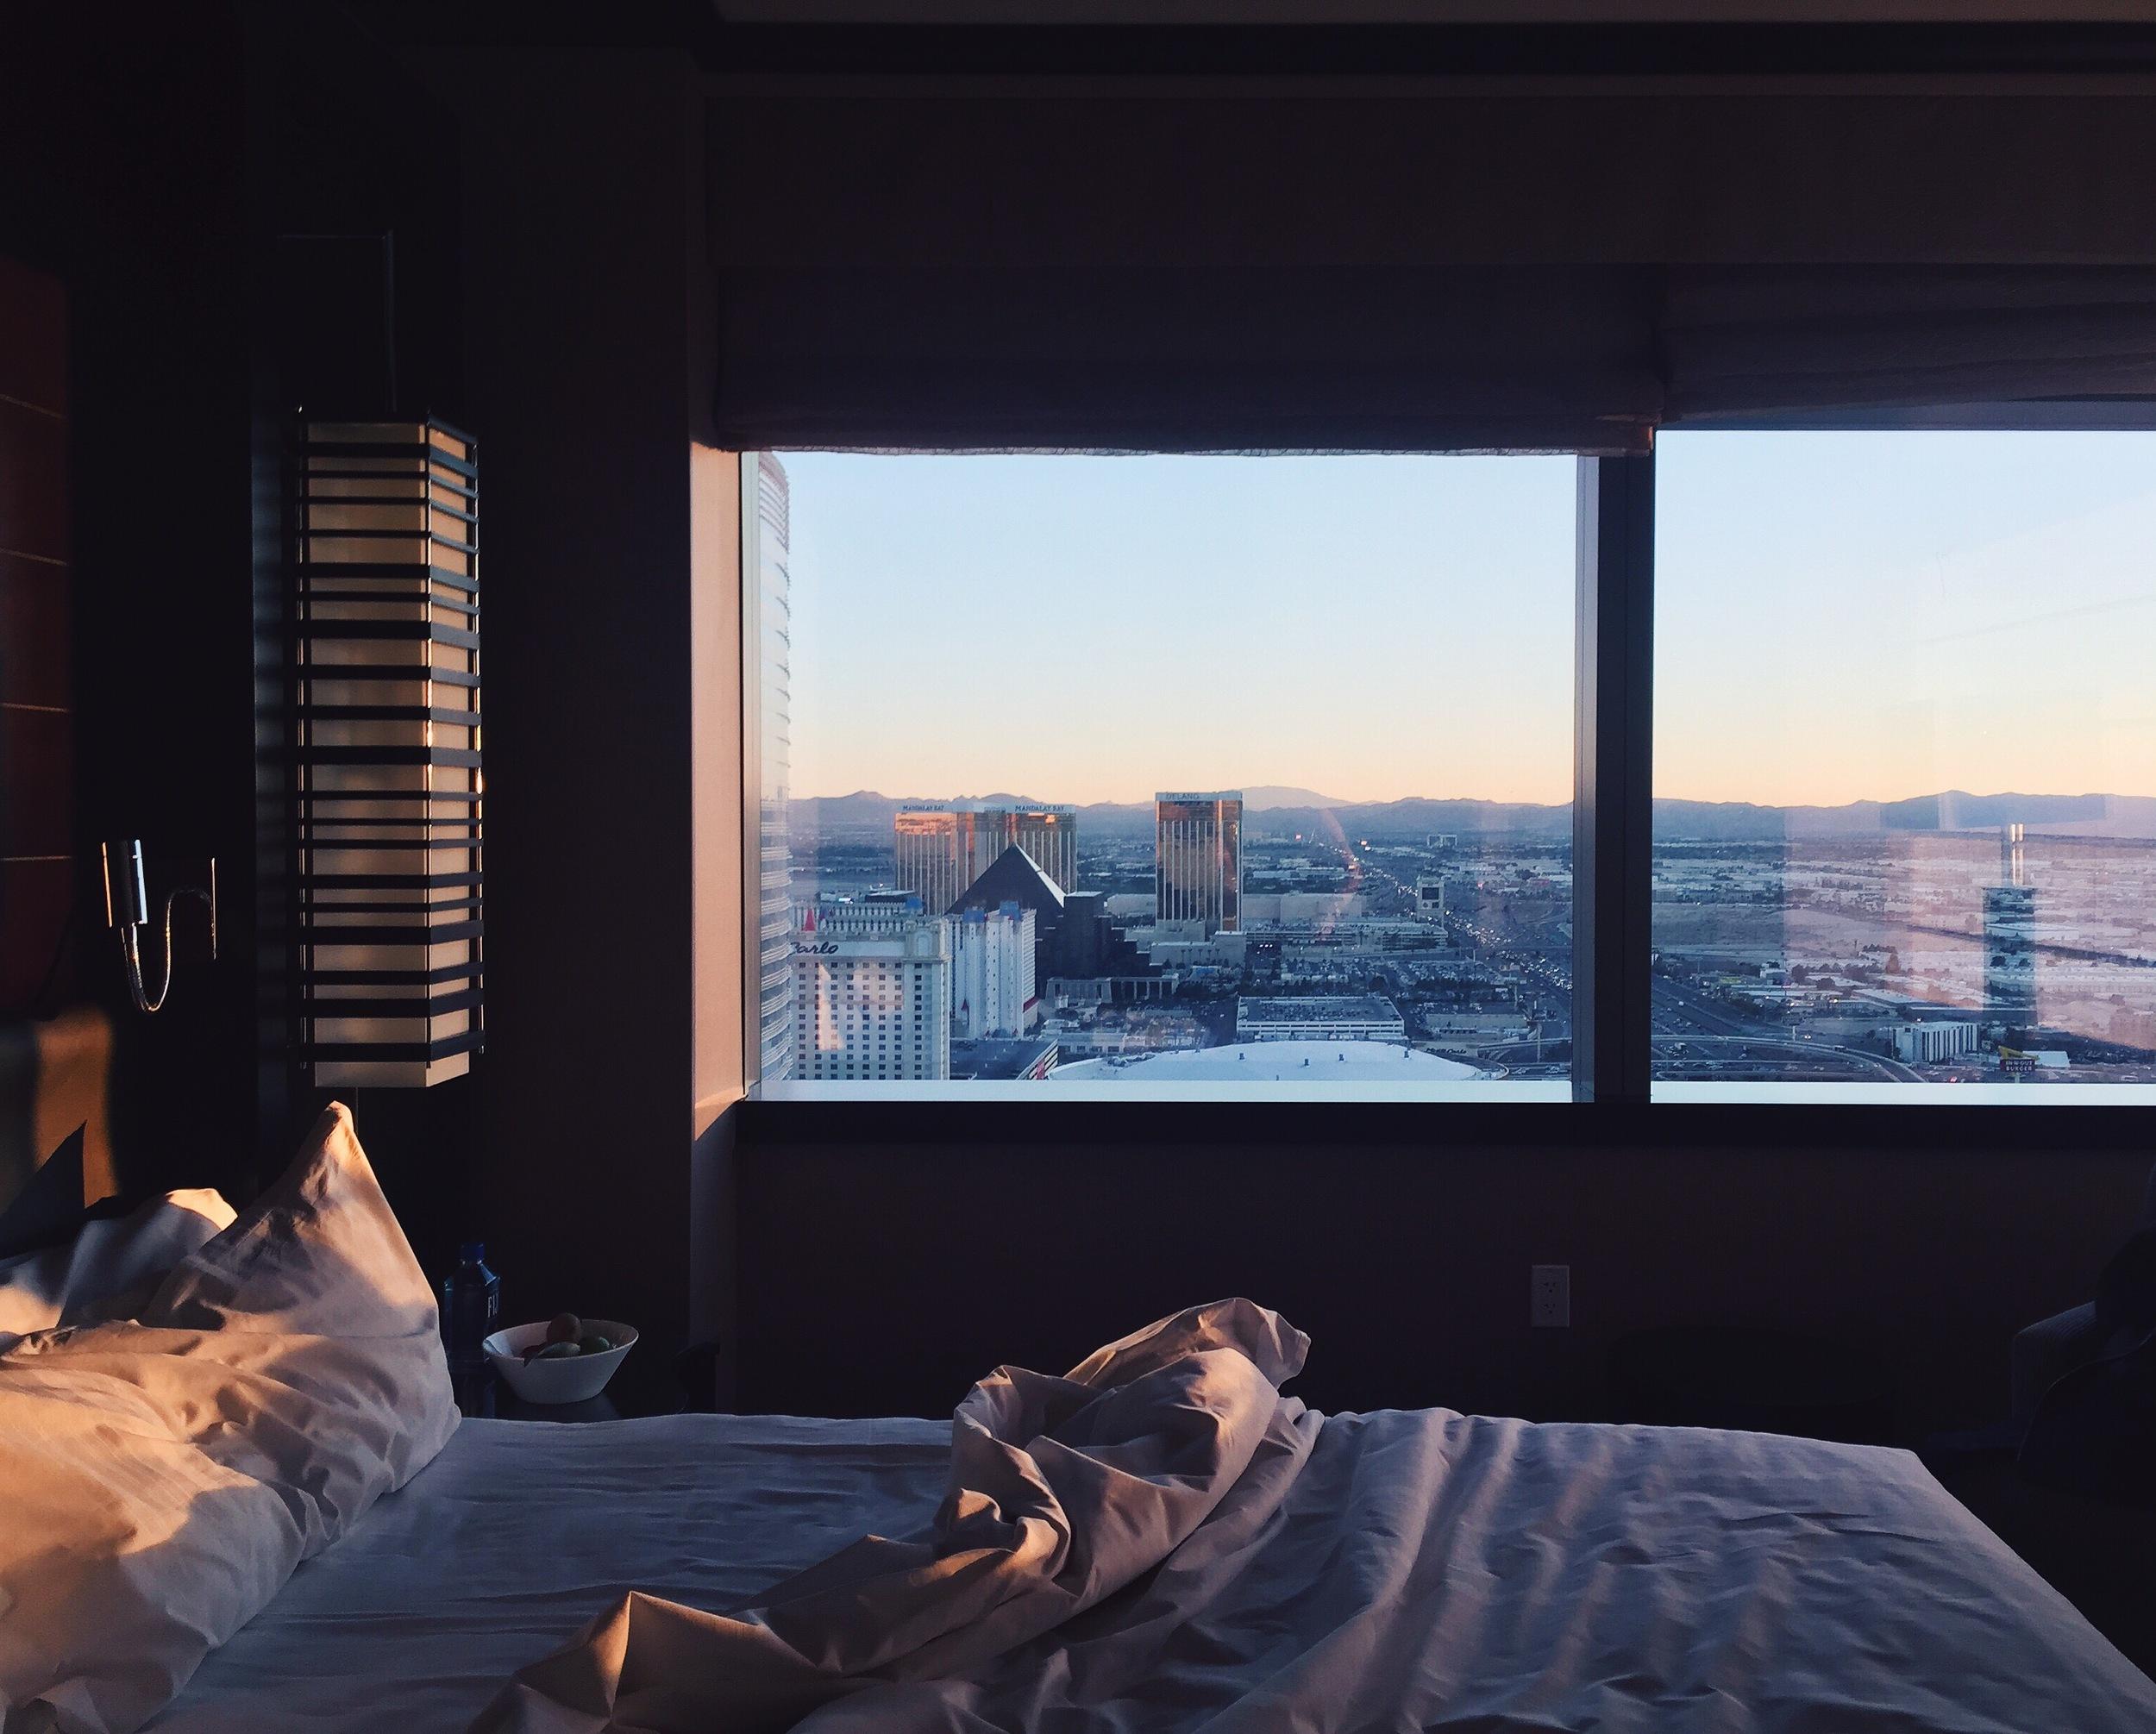 Las Vegas.November 2015.